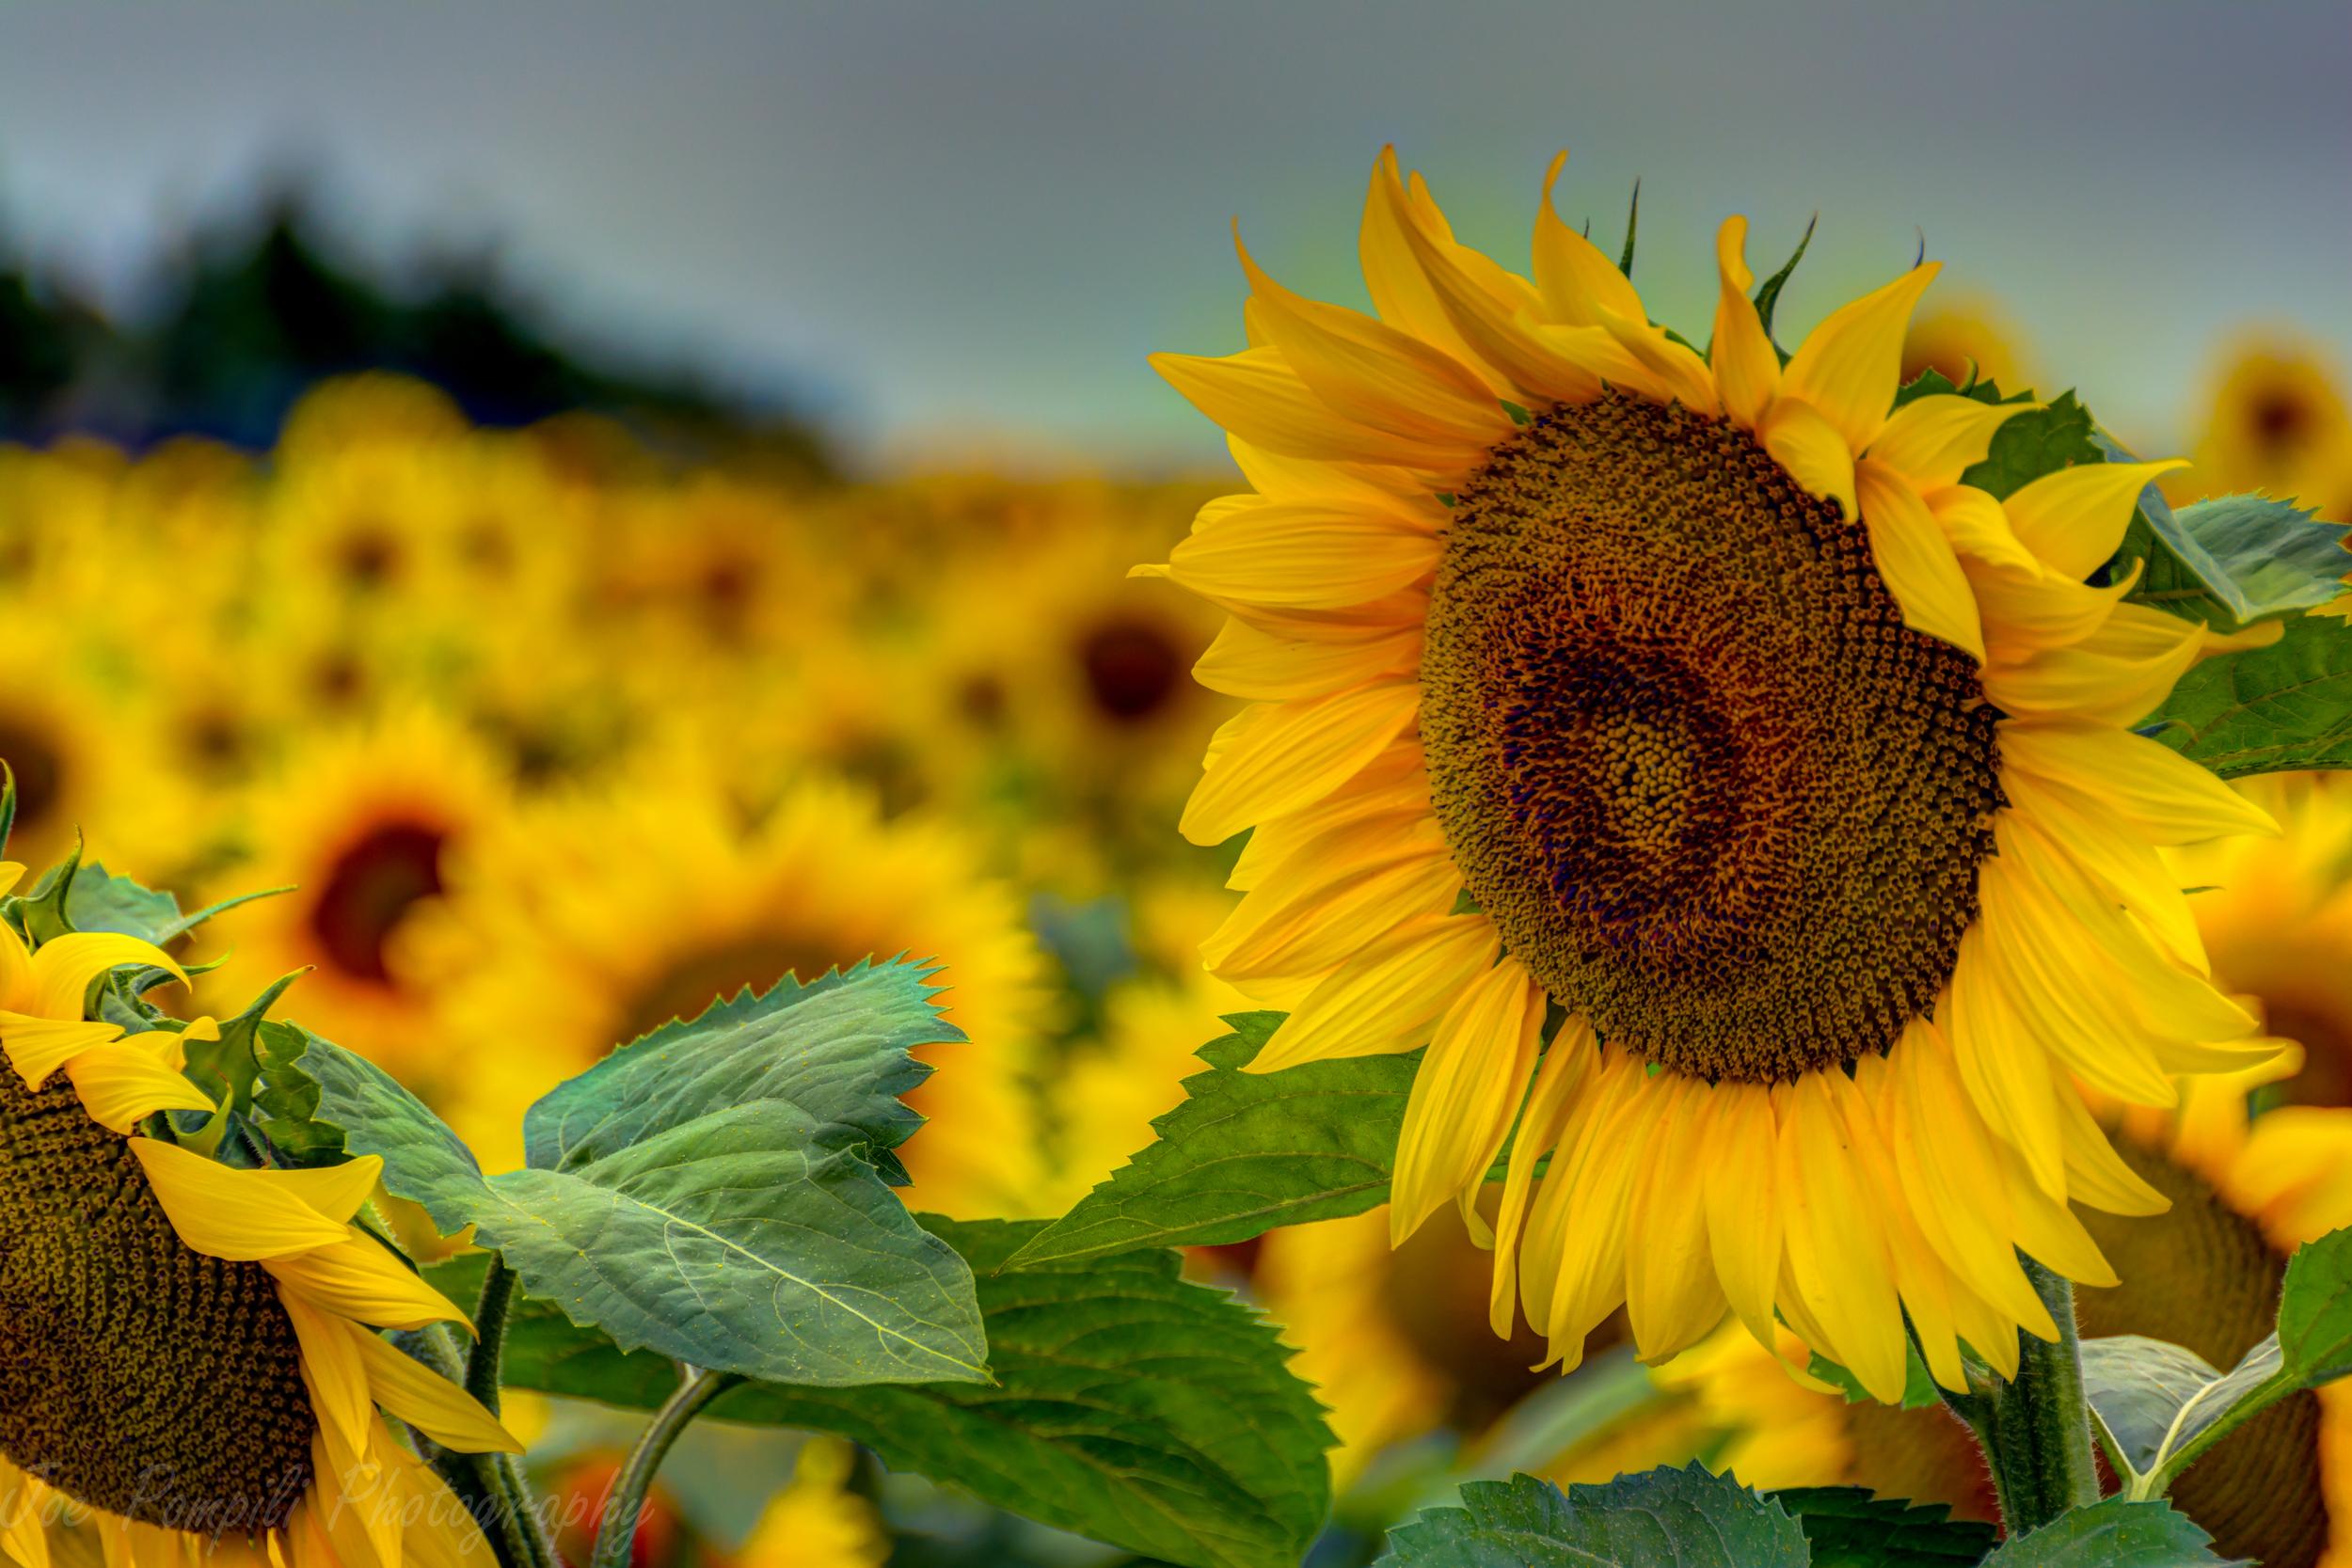 Calkins Road Sunflower Field #2P